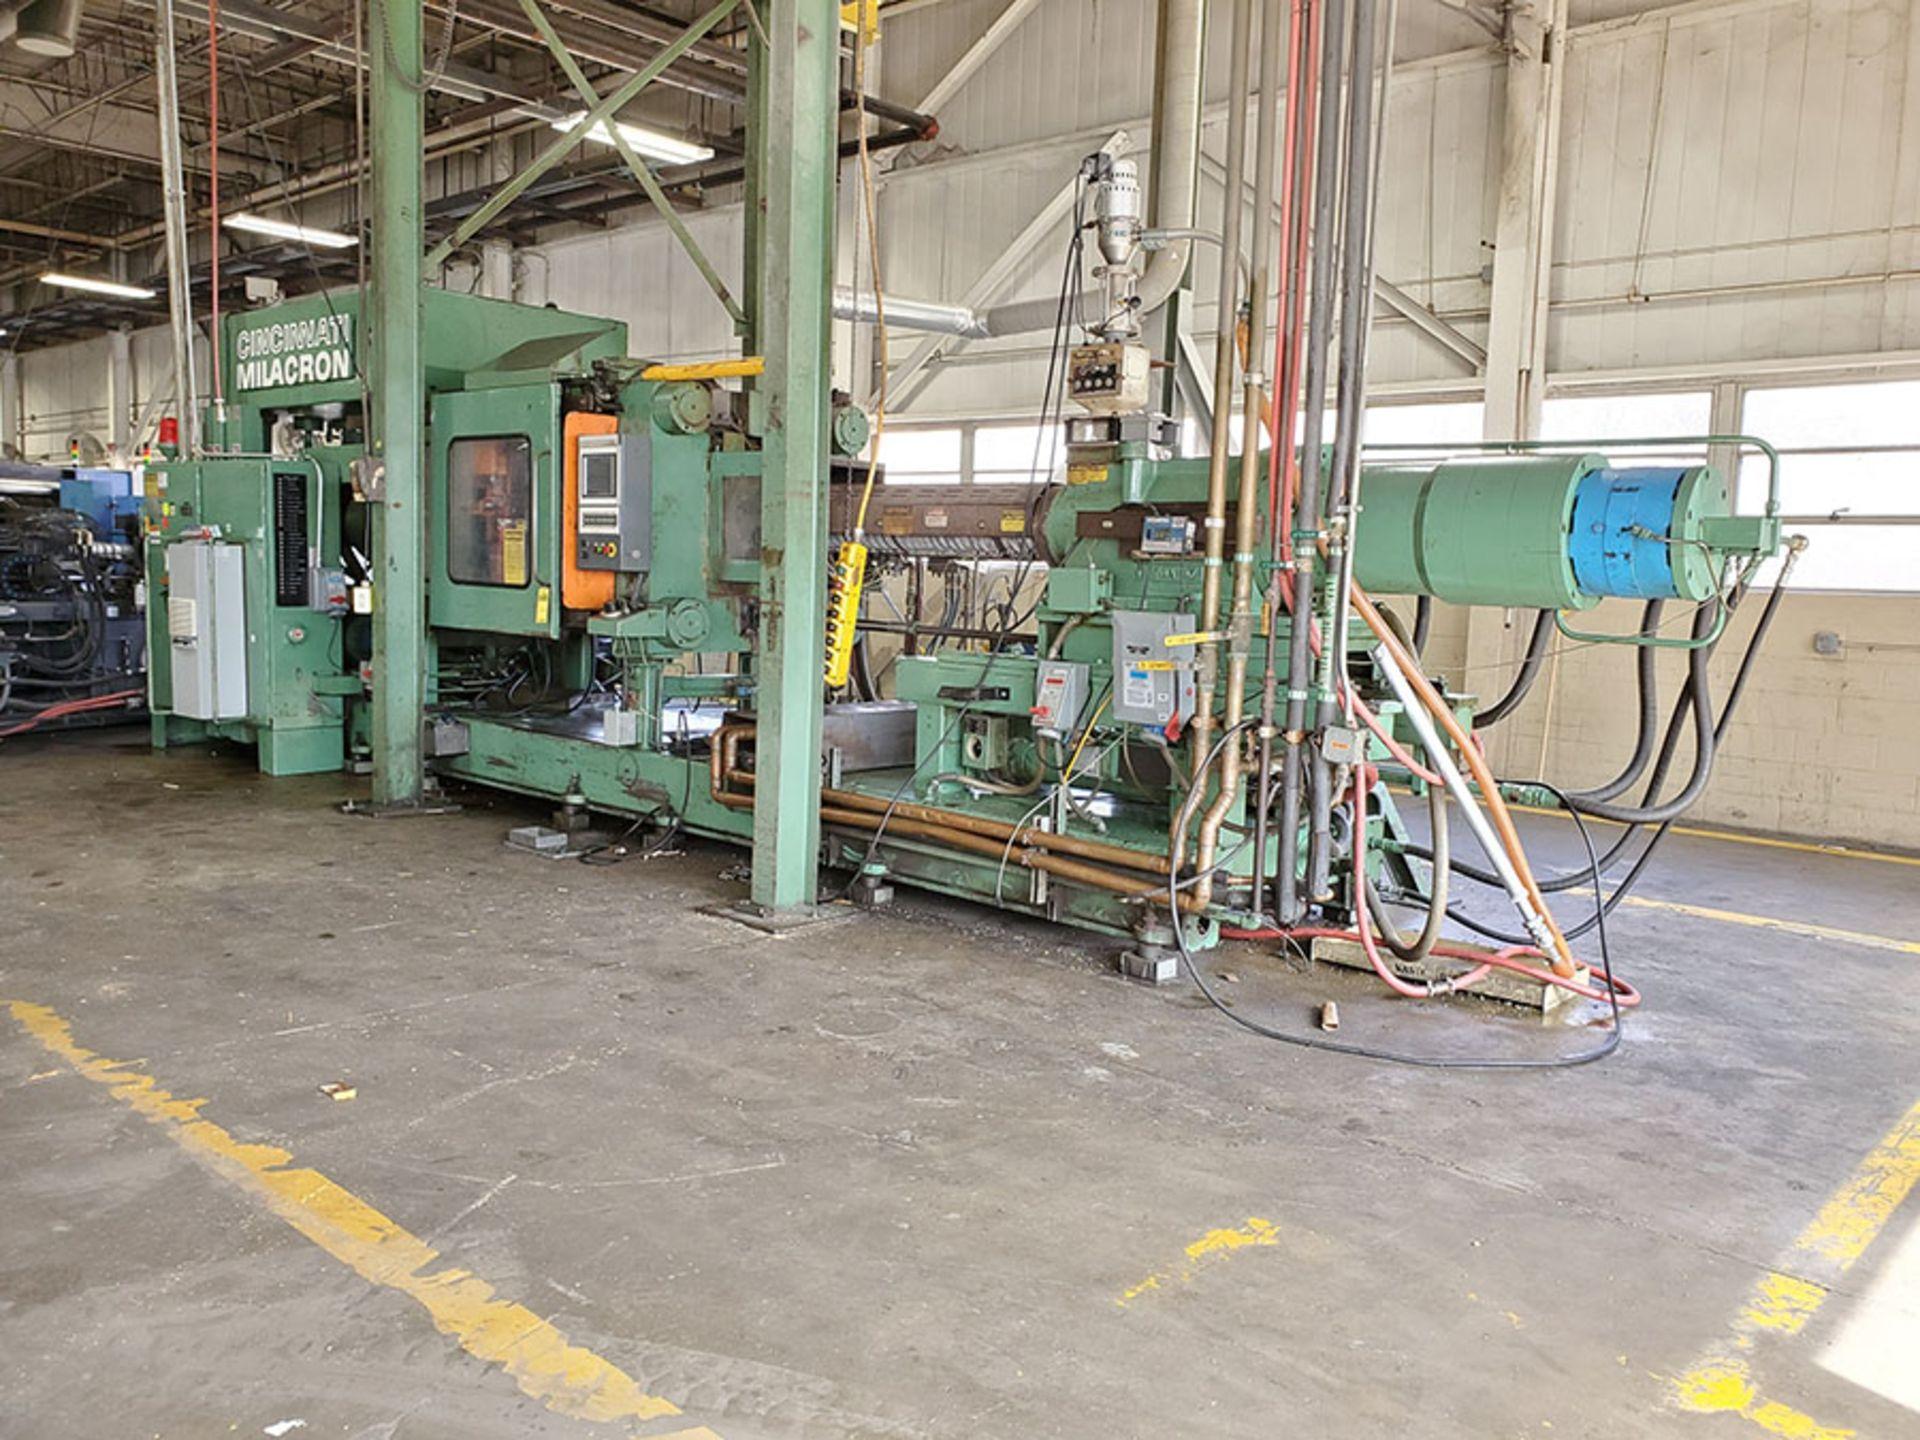 Lot 166 - CINCINNATI MILACRON PLASTIC INJECTION MOLDING MACHINE; 500-TON, MODEL 500-70, S/N 4025A21/85-38,